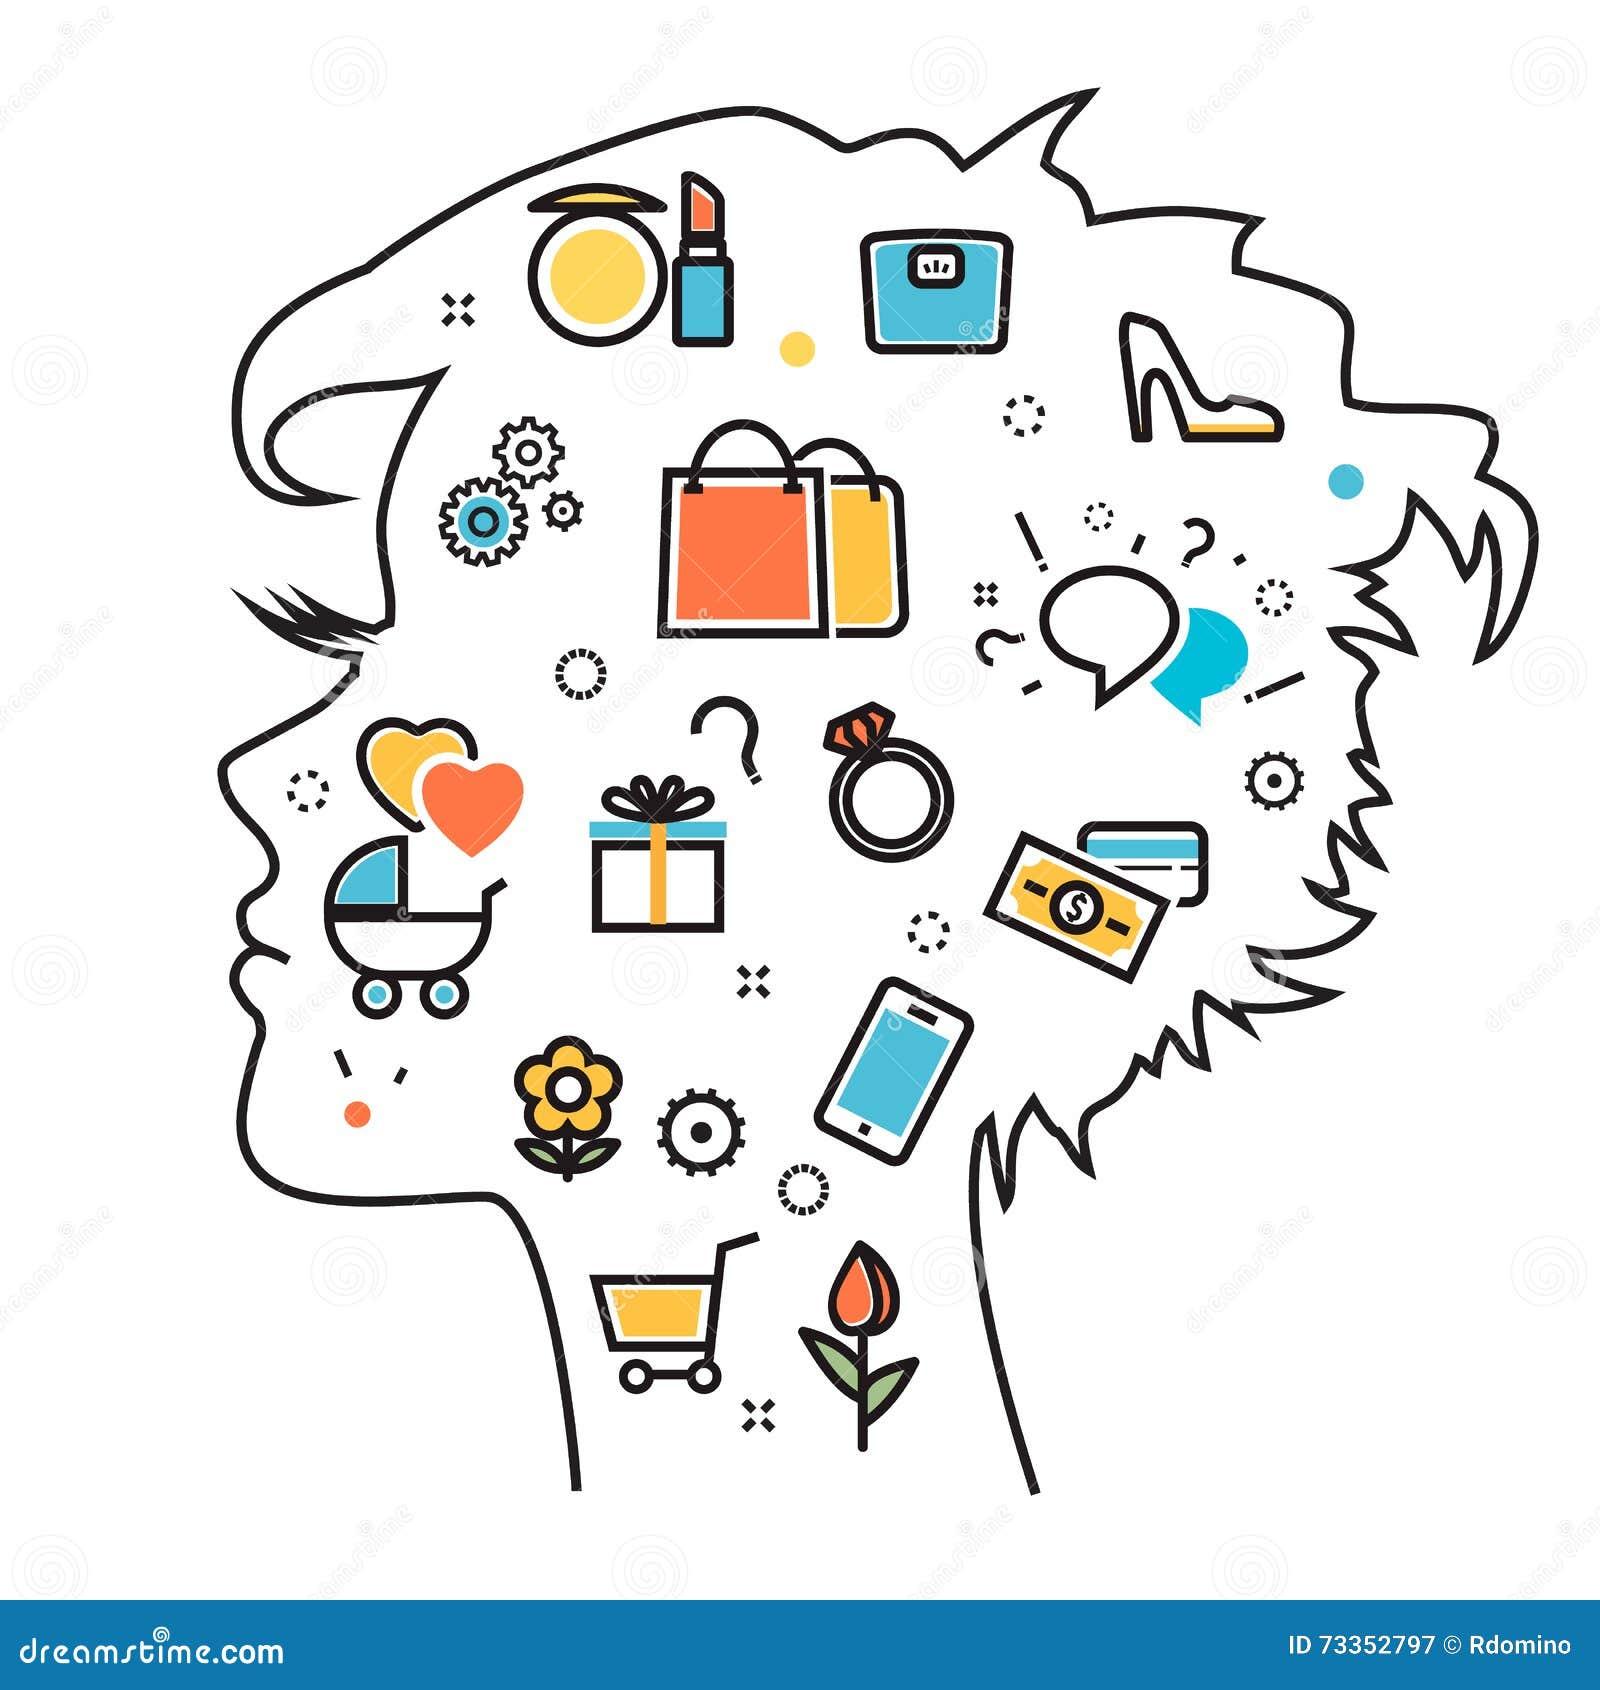 Woman Favorite Interests Dream Into Head Process Vector